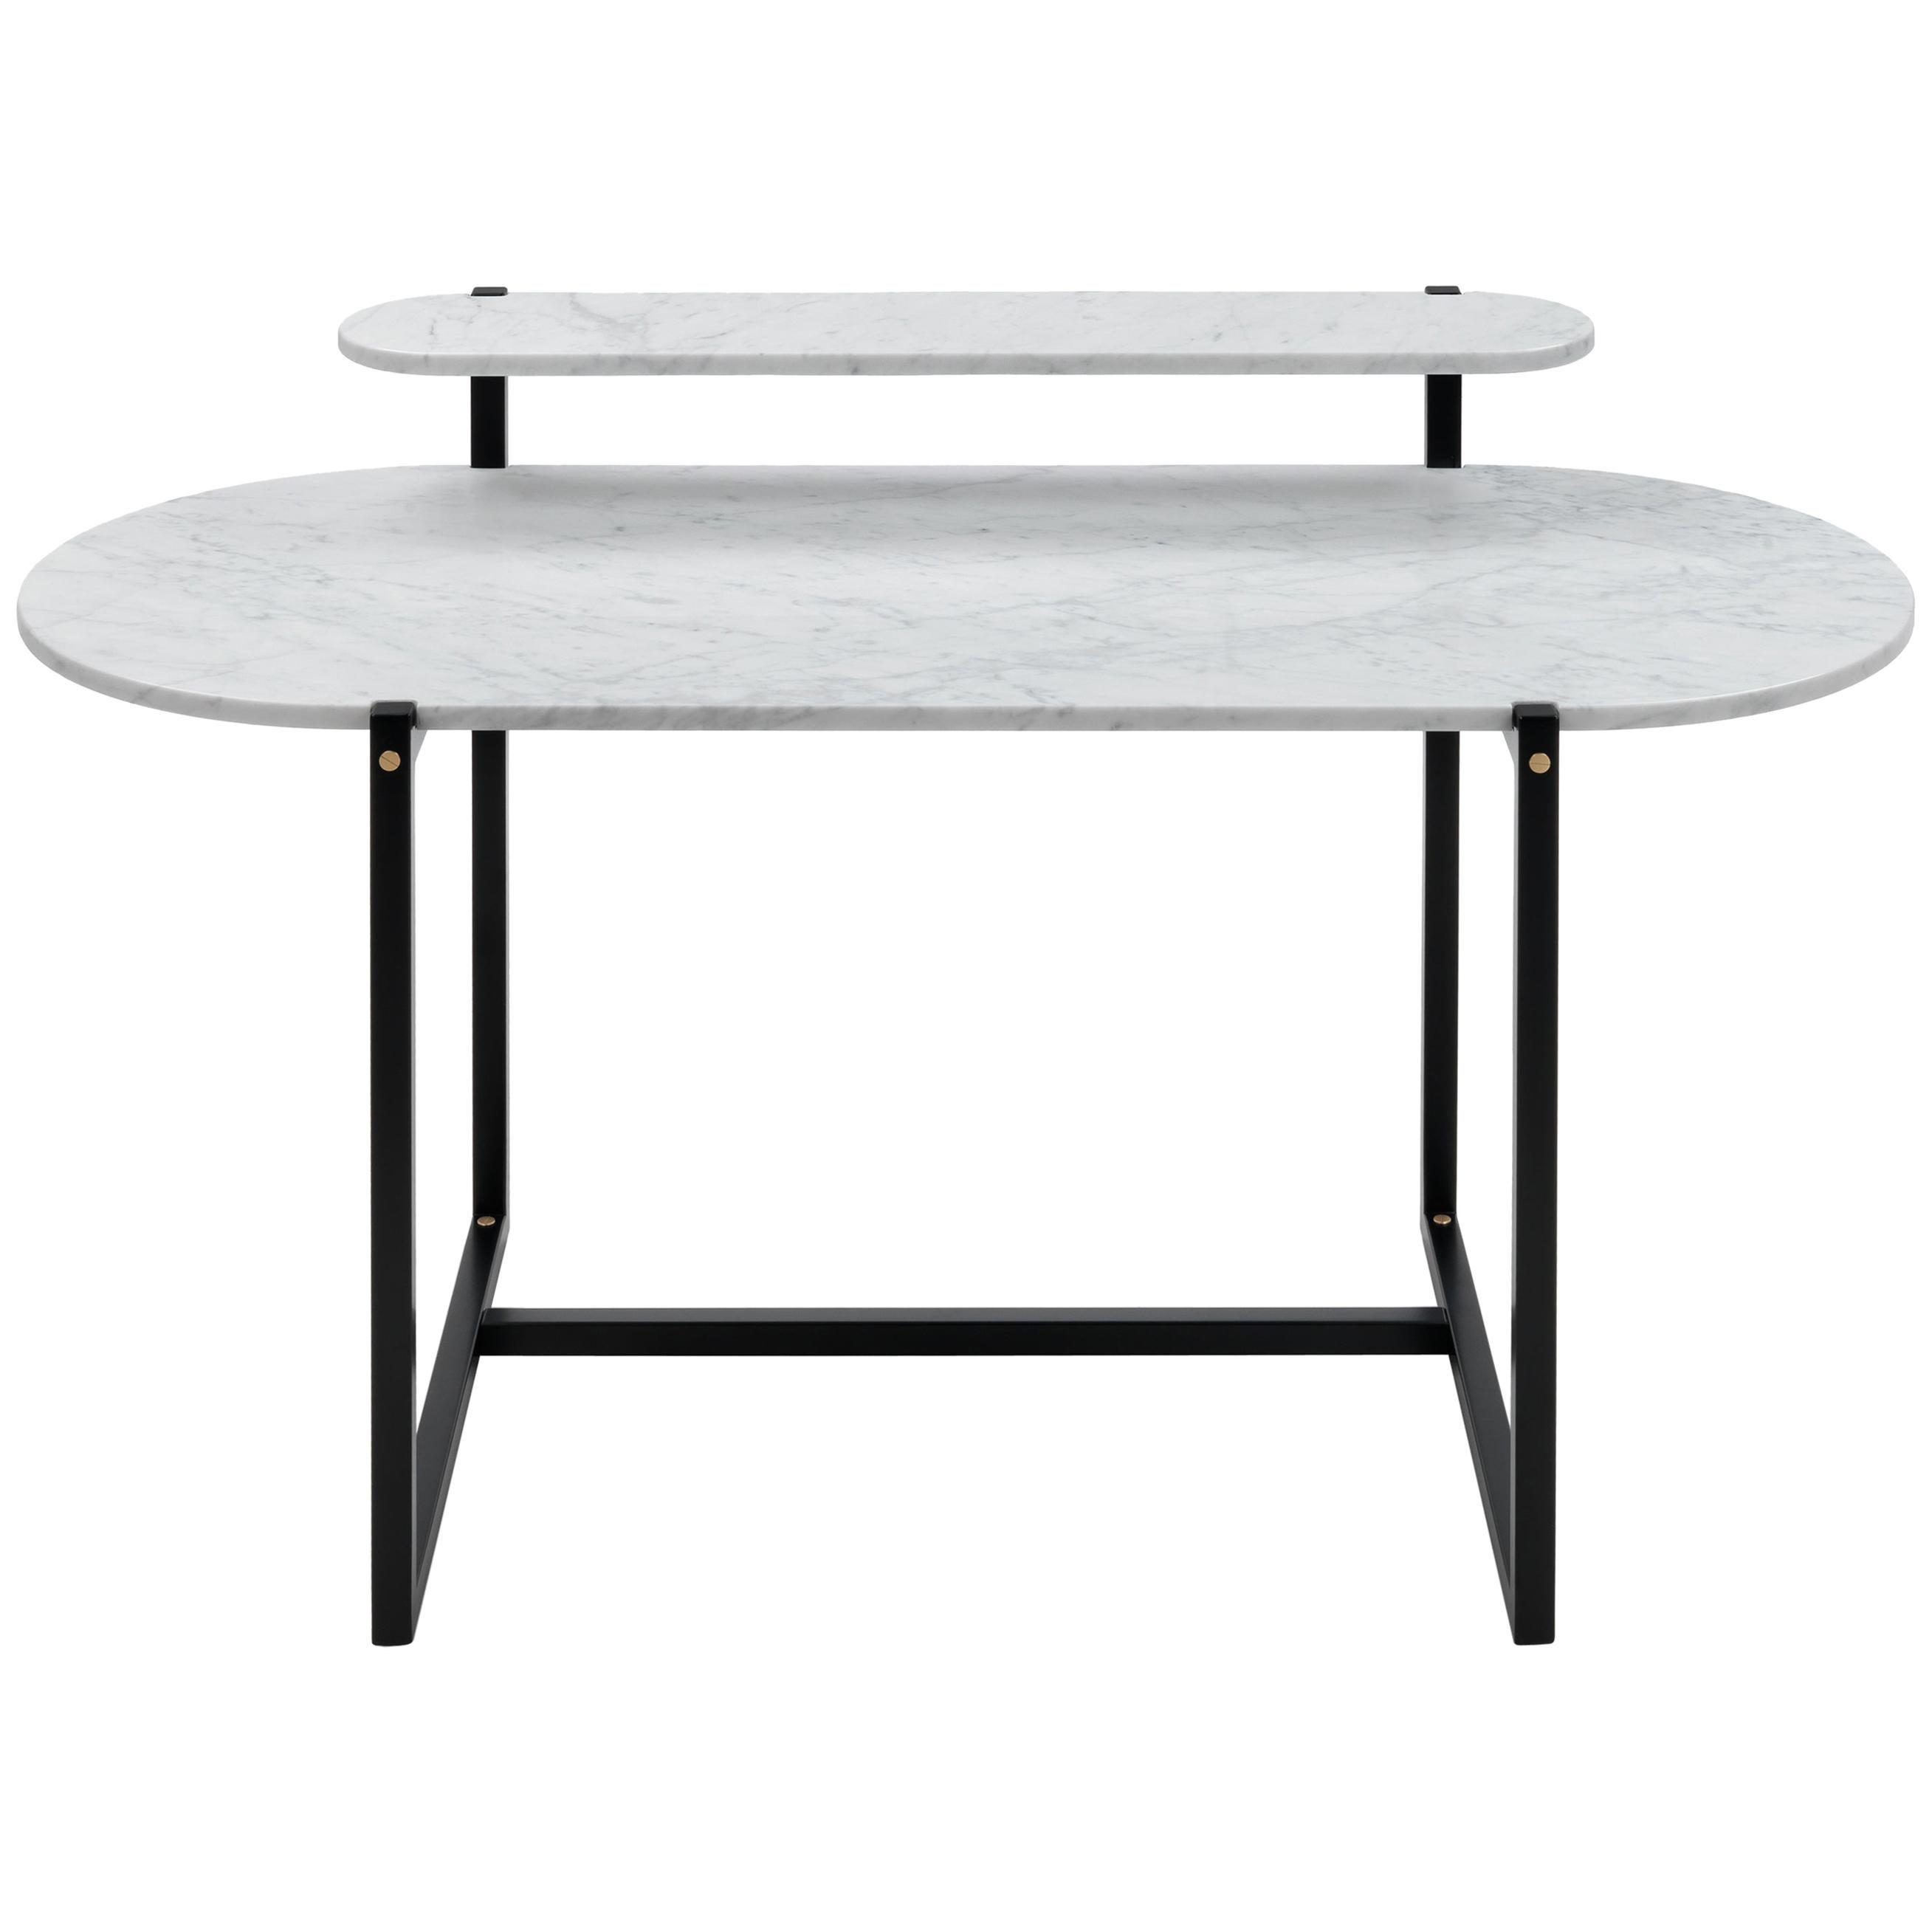 Arflex Sigmund Writing Desk in White Carrara Top with Metal Base by Studio Asai